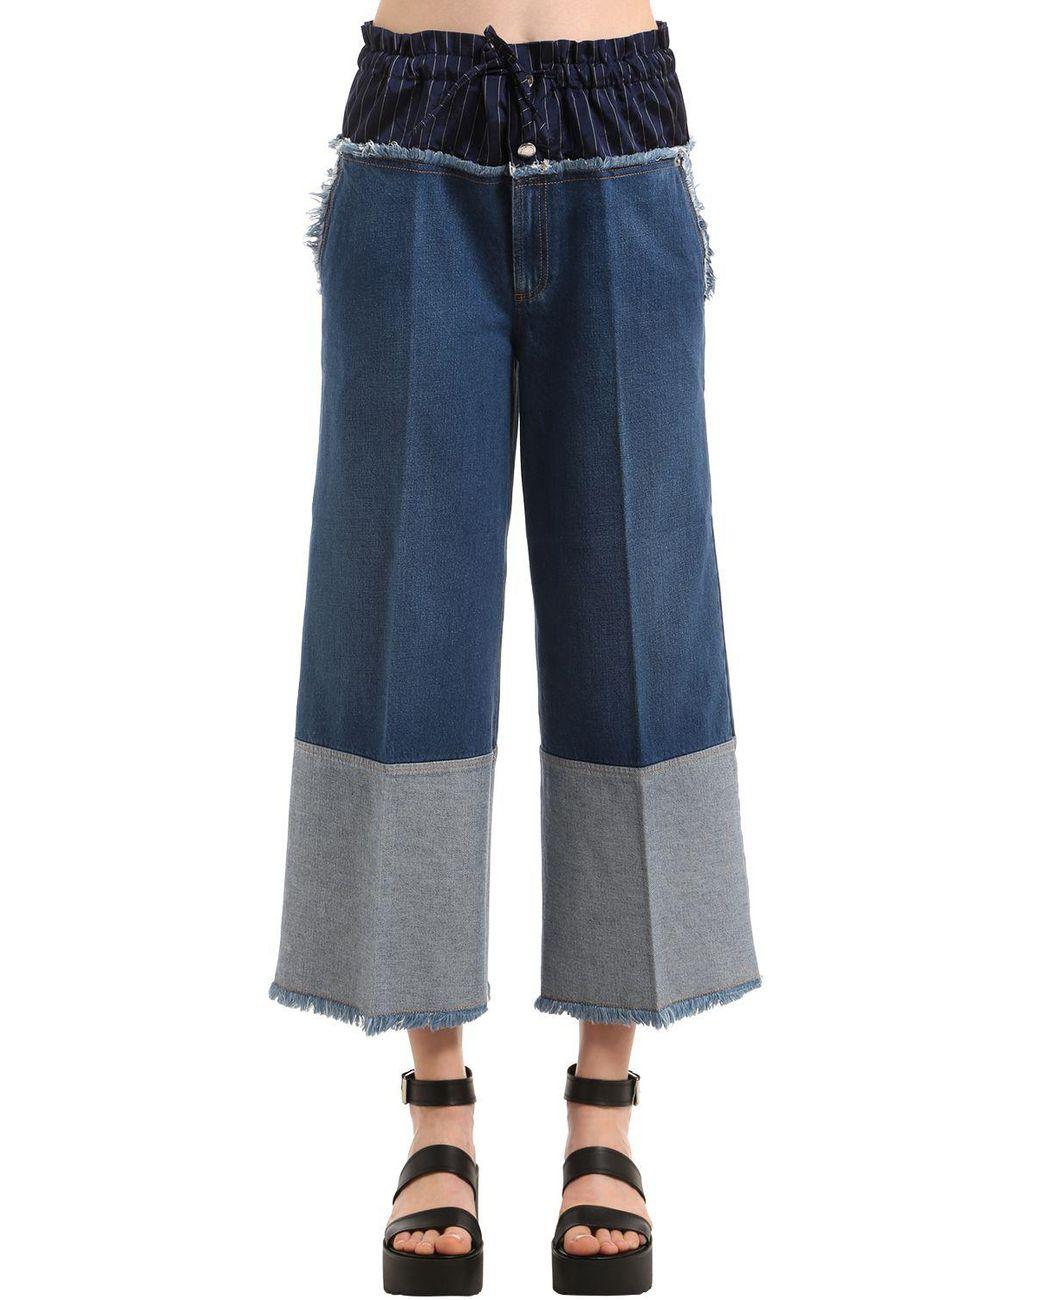 be084da181 Sonia Rykiel Cropped Denim Jeans W/ Boxer Waist in Blue - Lyst